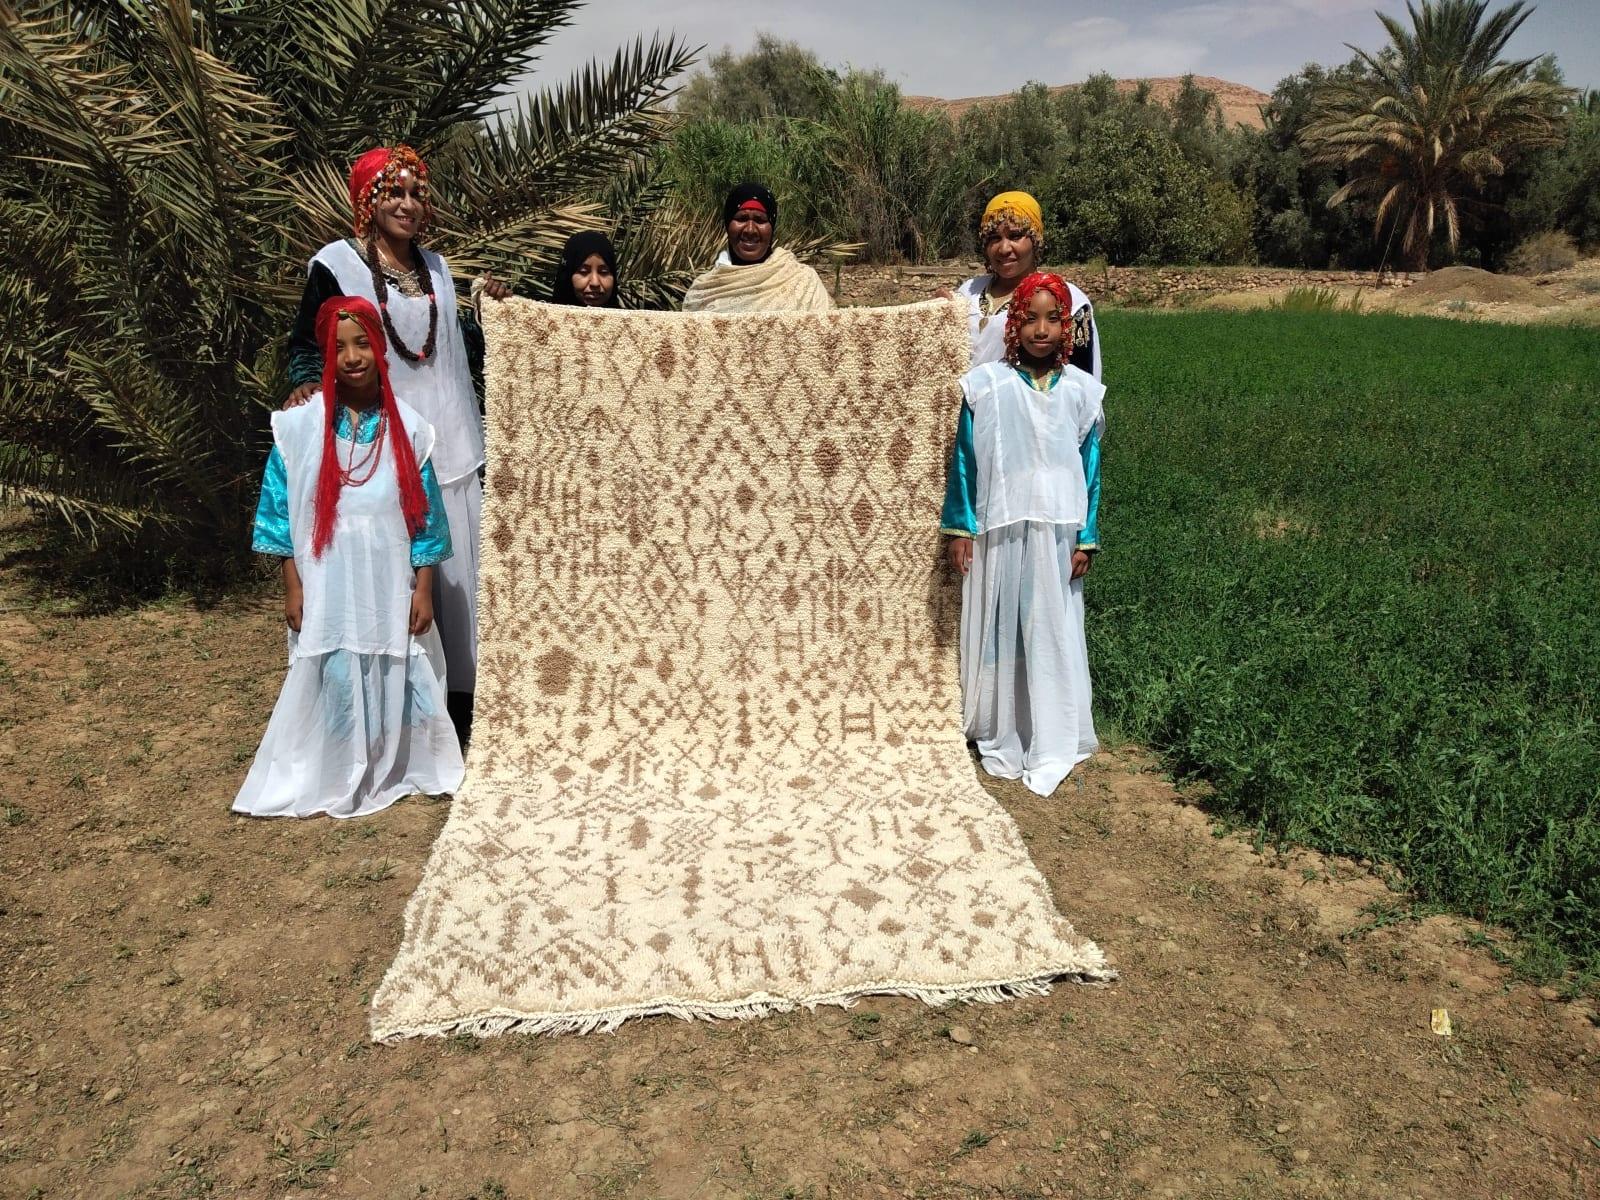 Pile Knot Rug Cotton Warp Brown, White Morocco